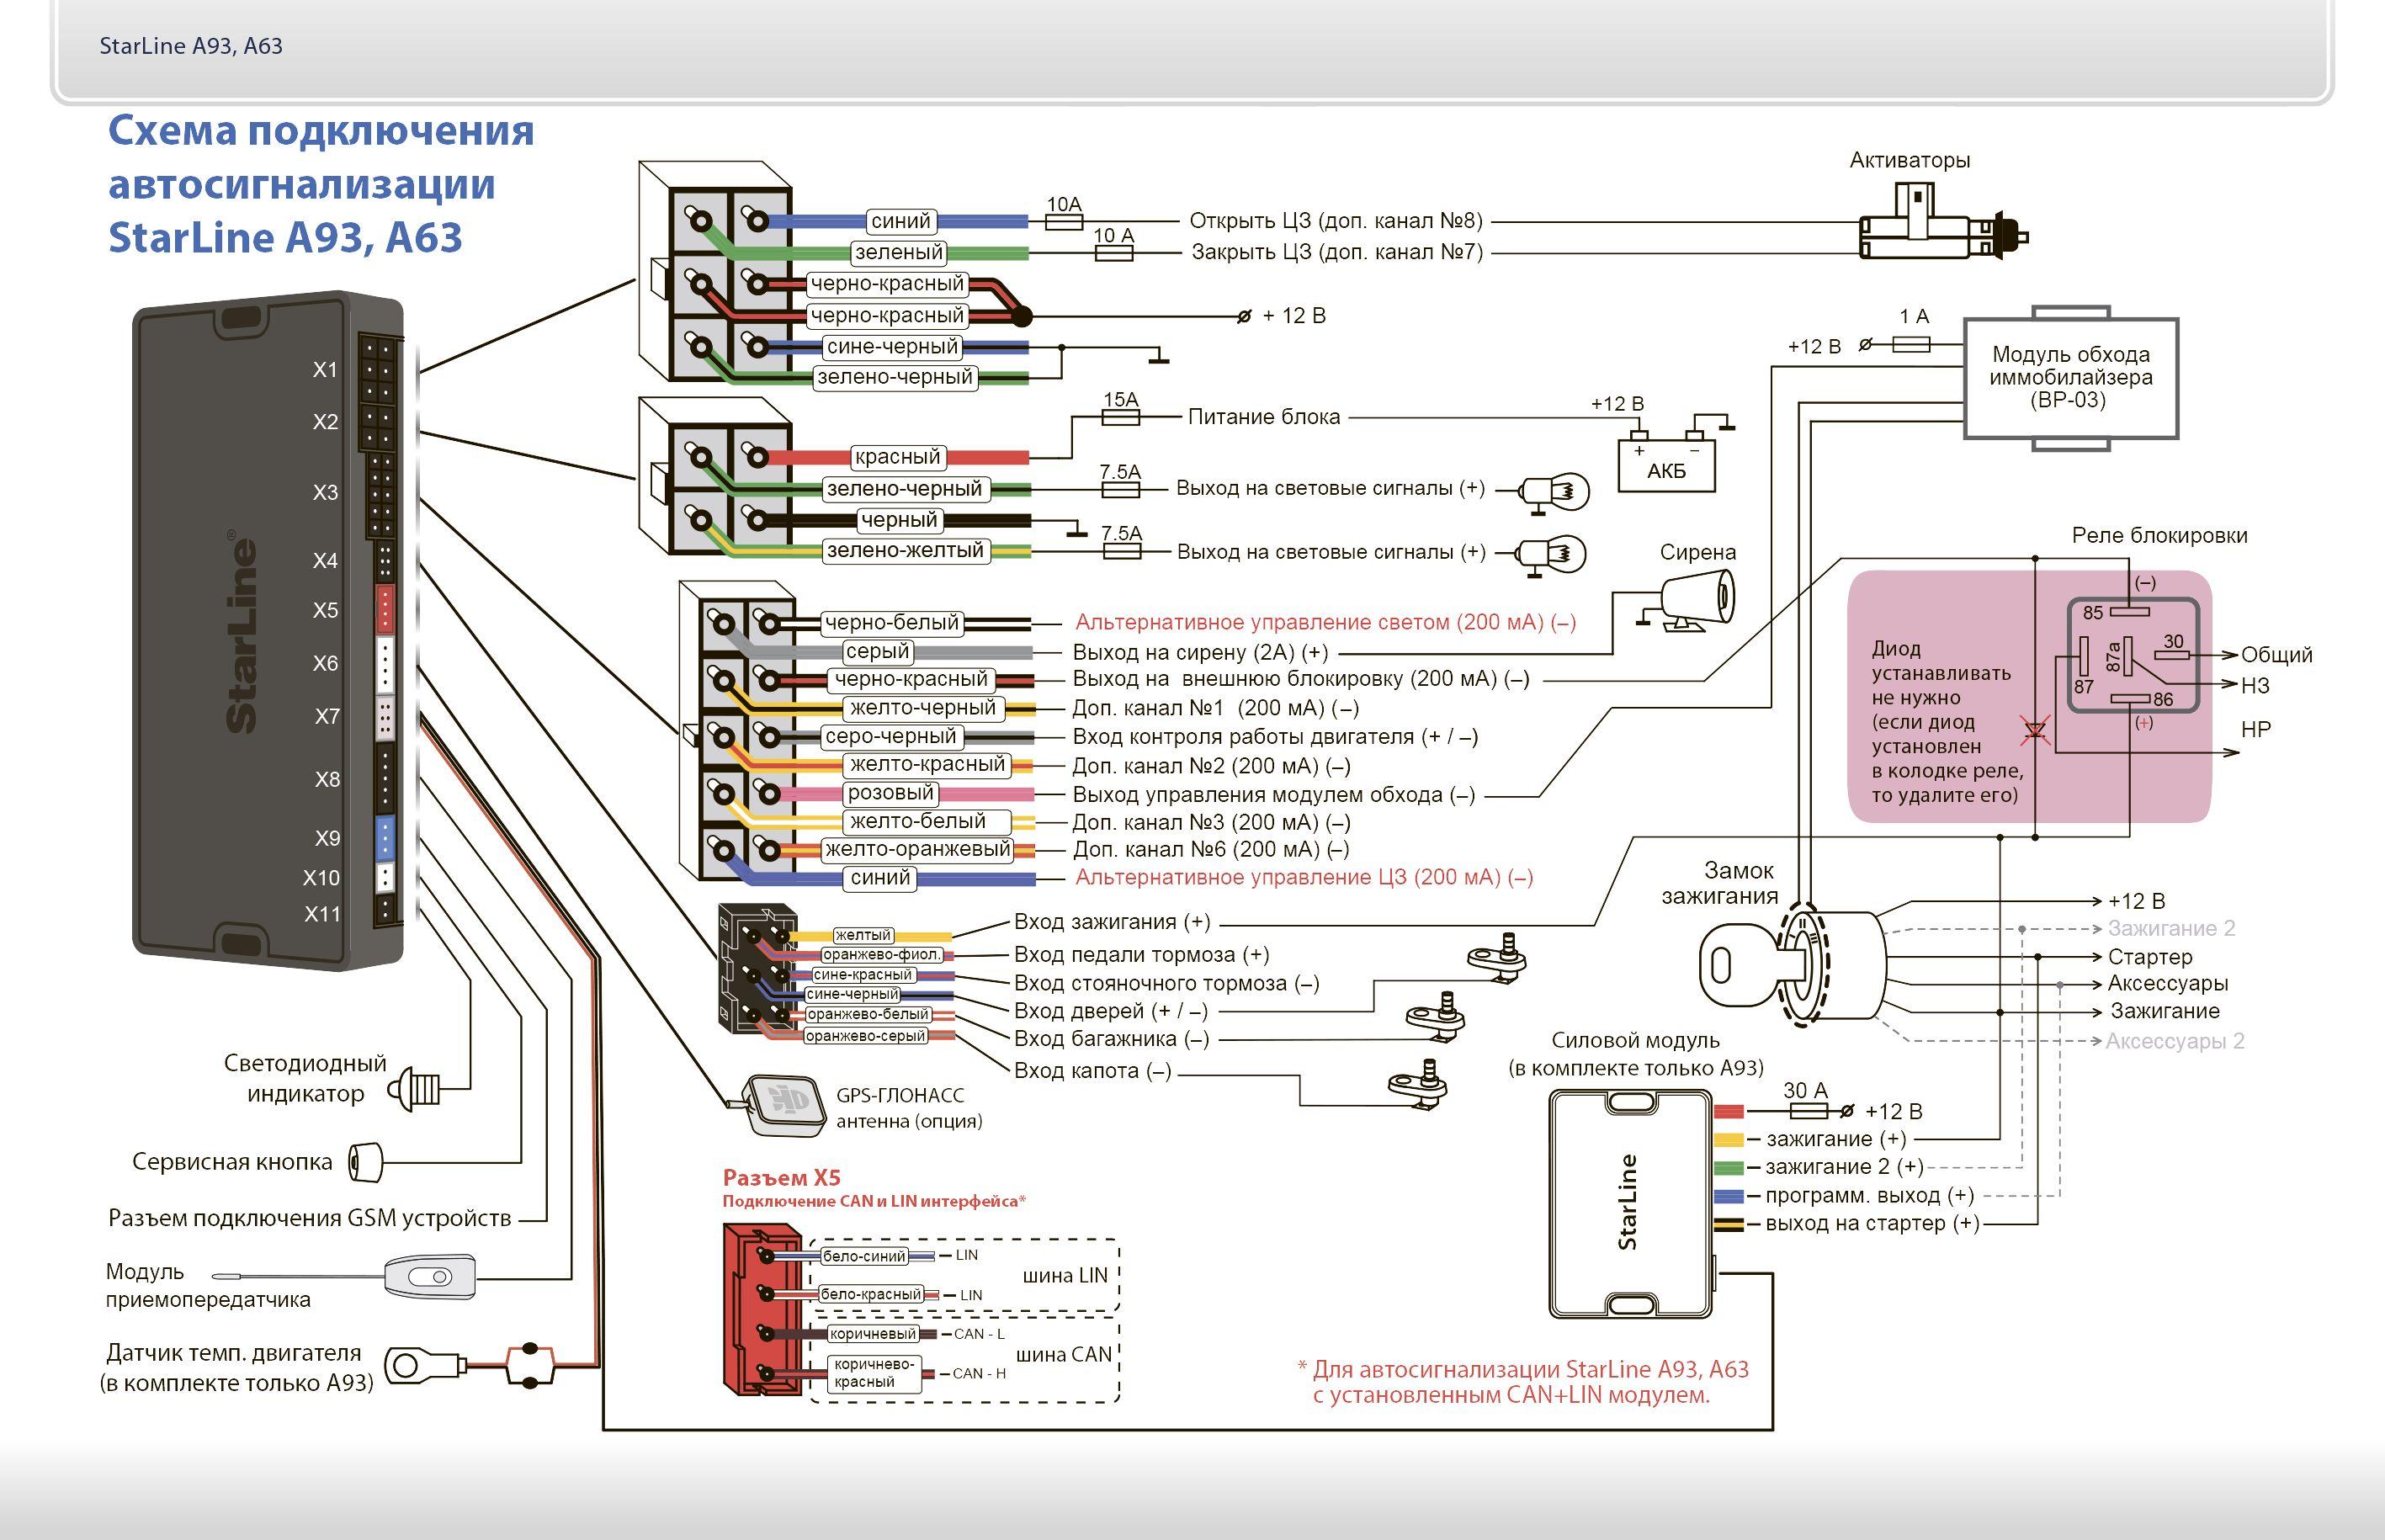 Starline m17 подключения схемы